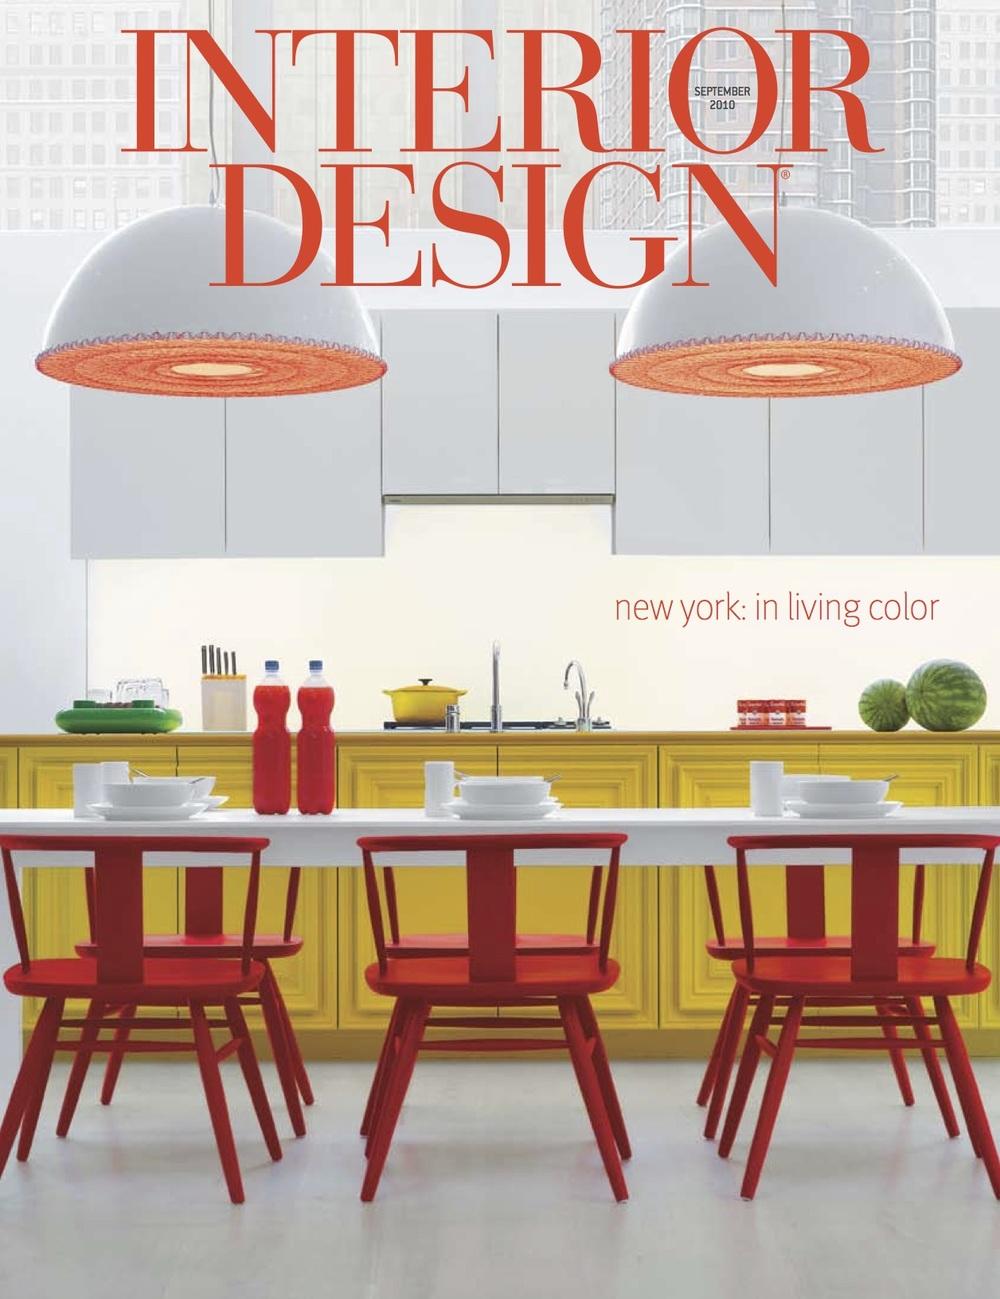 ATI   EB Interior Design Article September 2010 PRESENTATION Pdf